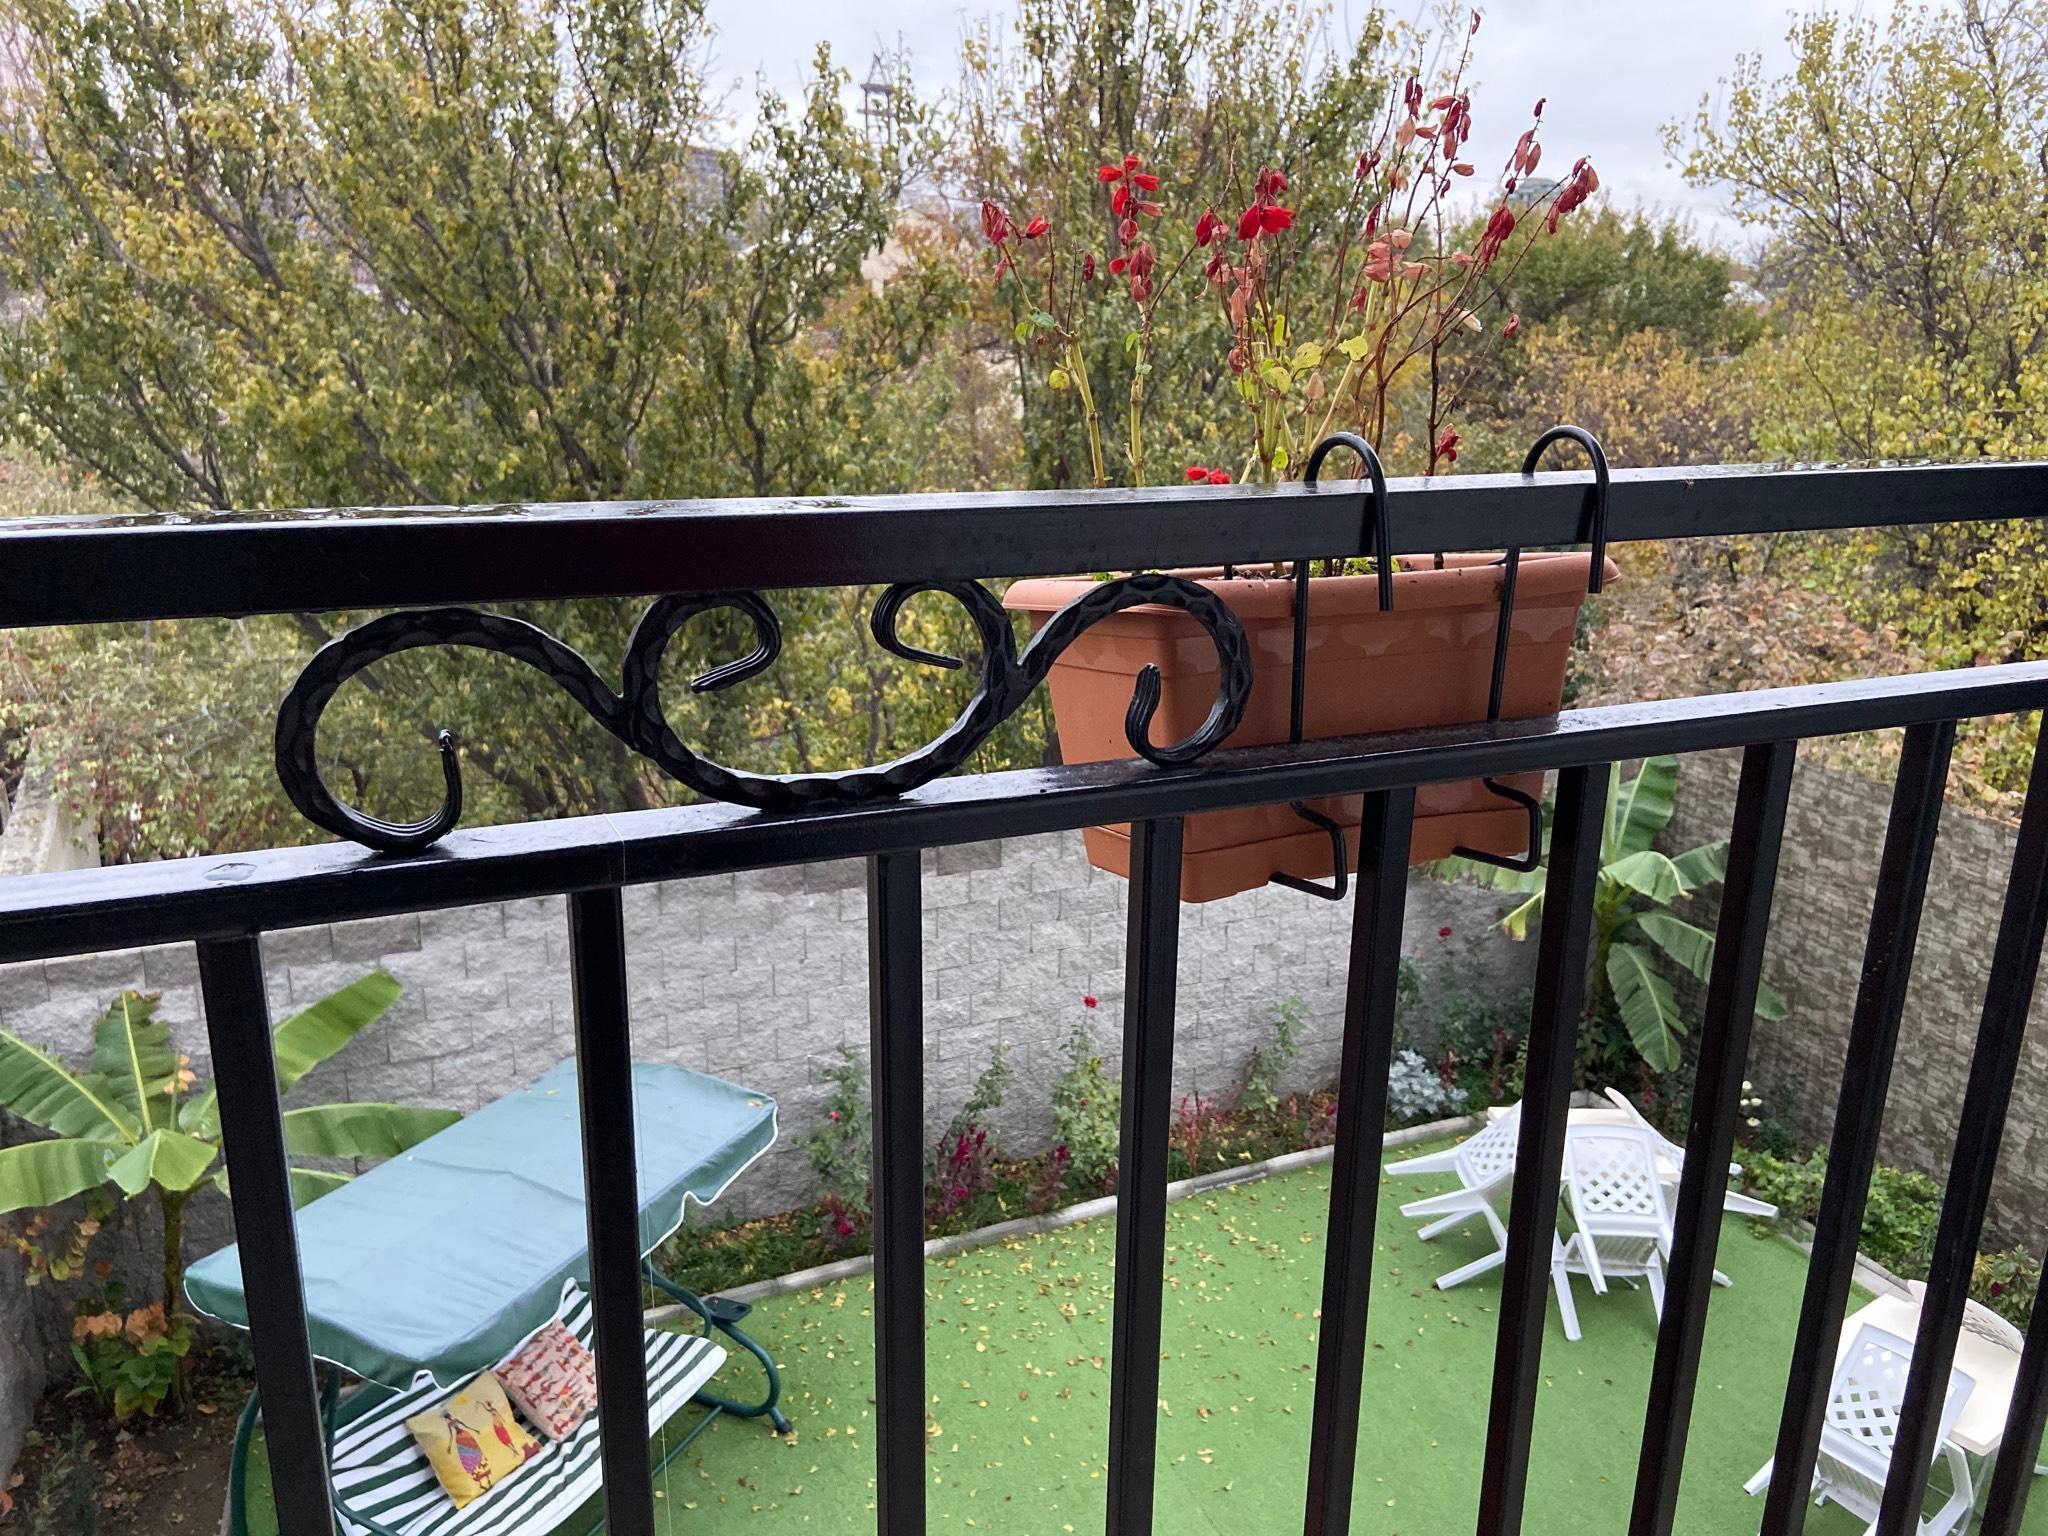 Villa Apart Hotel With Garden And Barbecue Zone